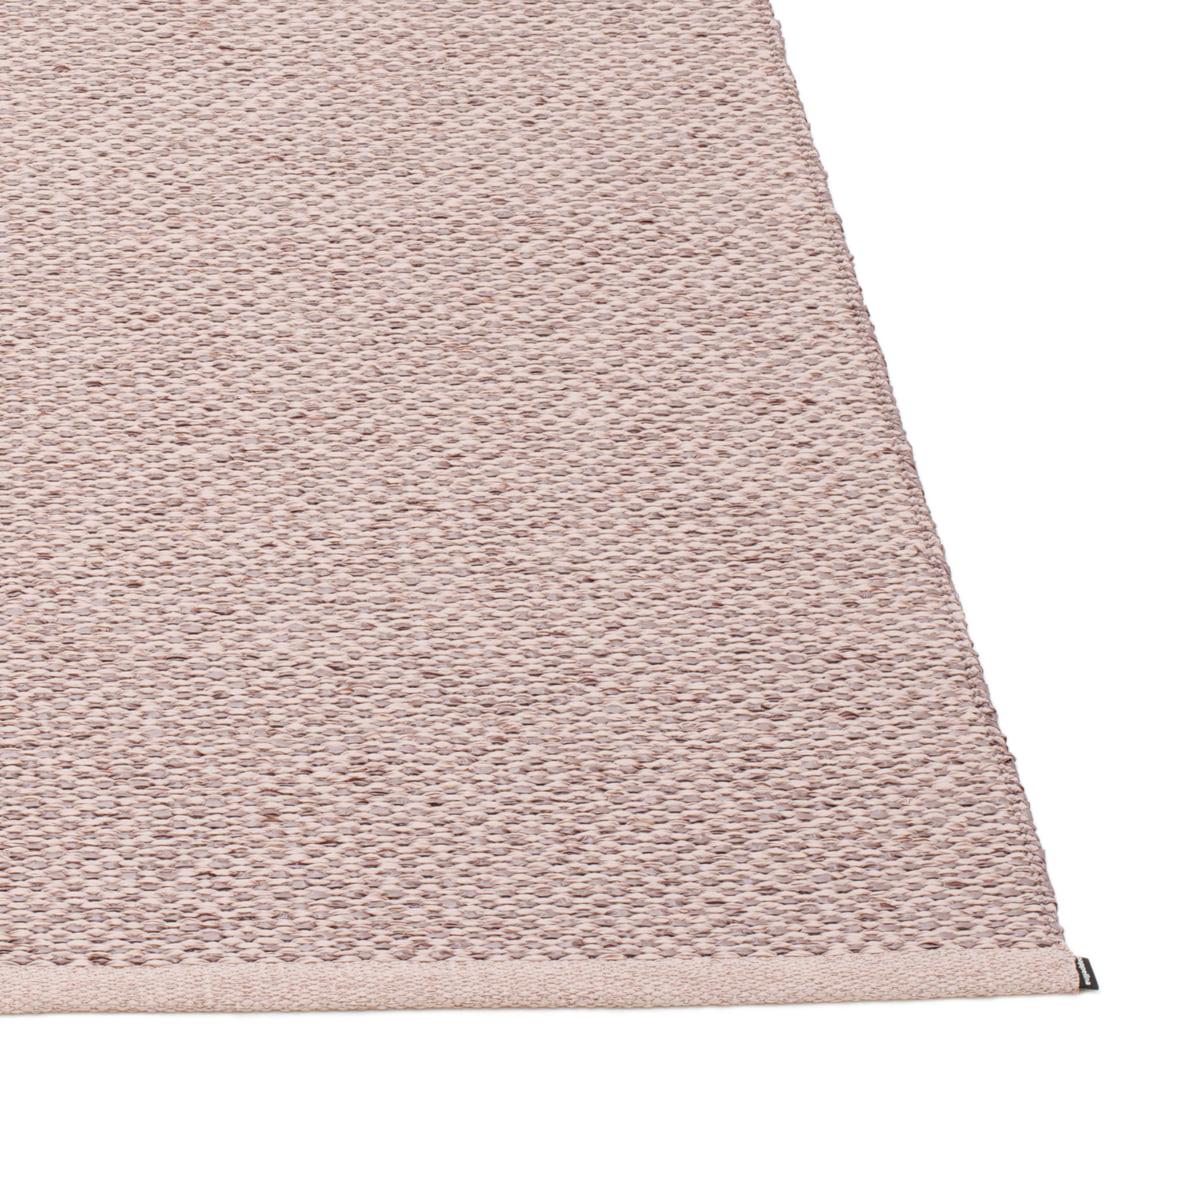 svea outdoor rug by pappelina in the shop. Black Bedroom Furniture Sets. Home Design Ideas